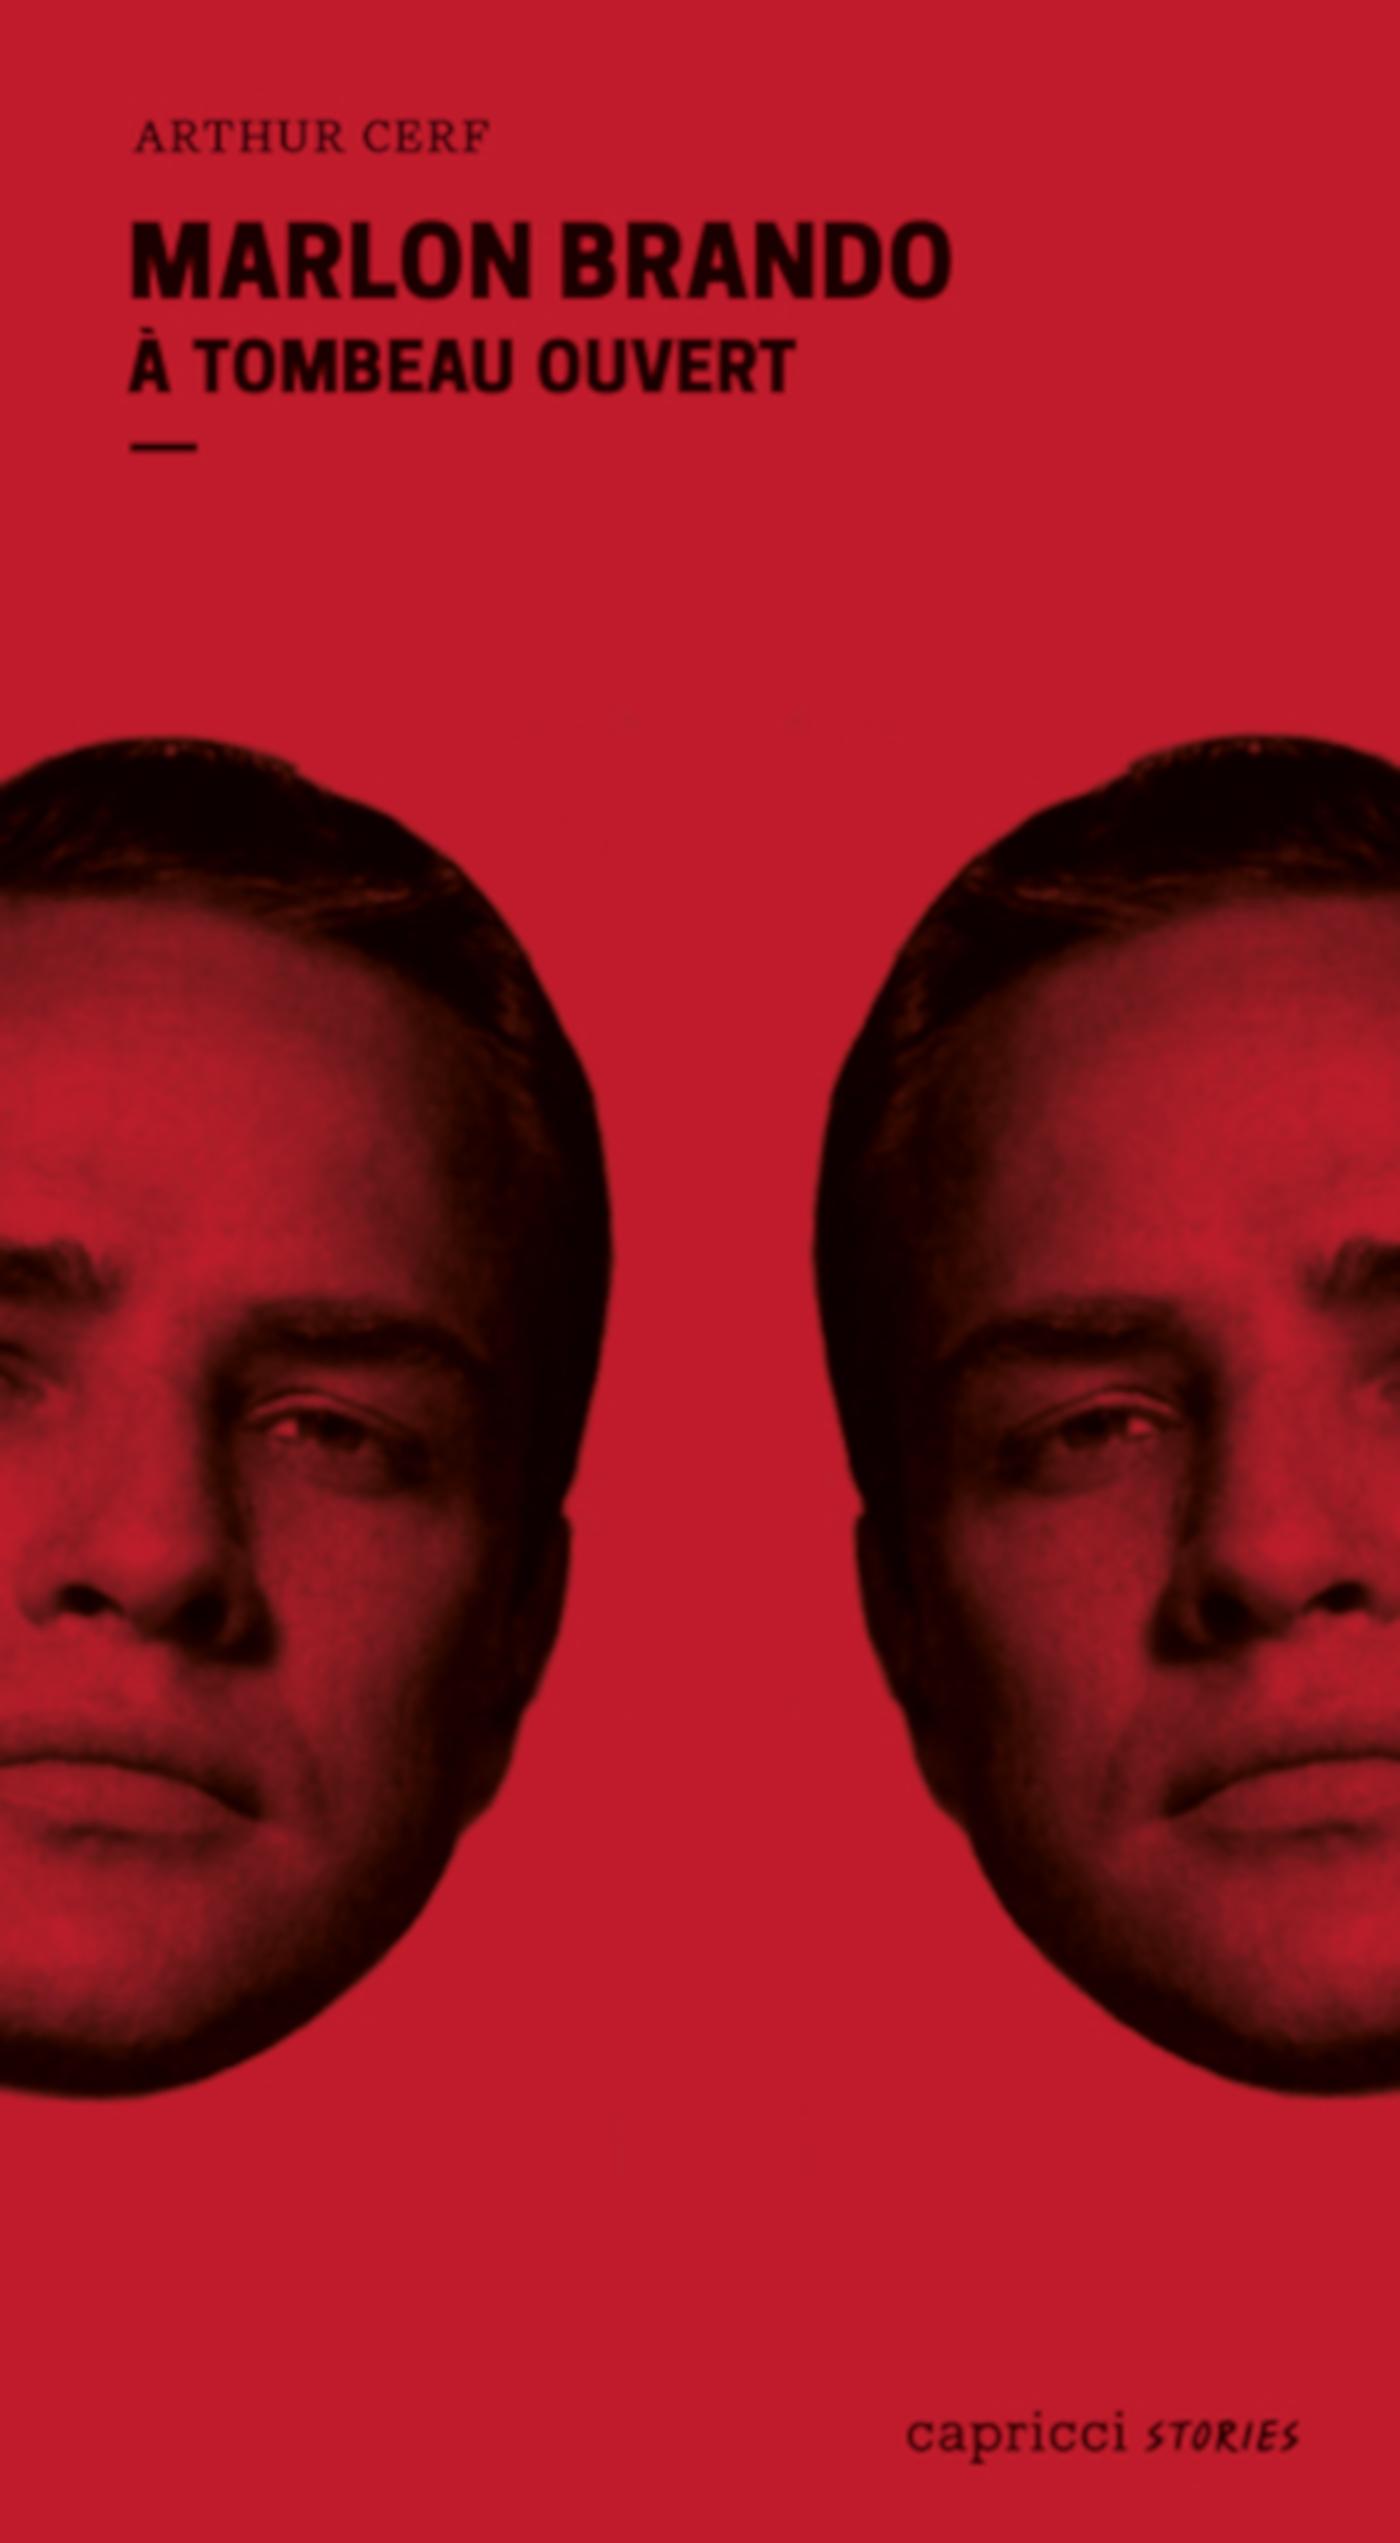 Marlon Brando, Les stars durent dix ans